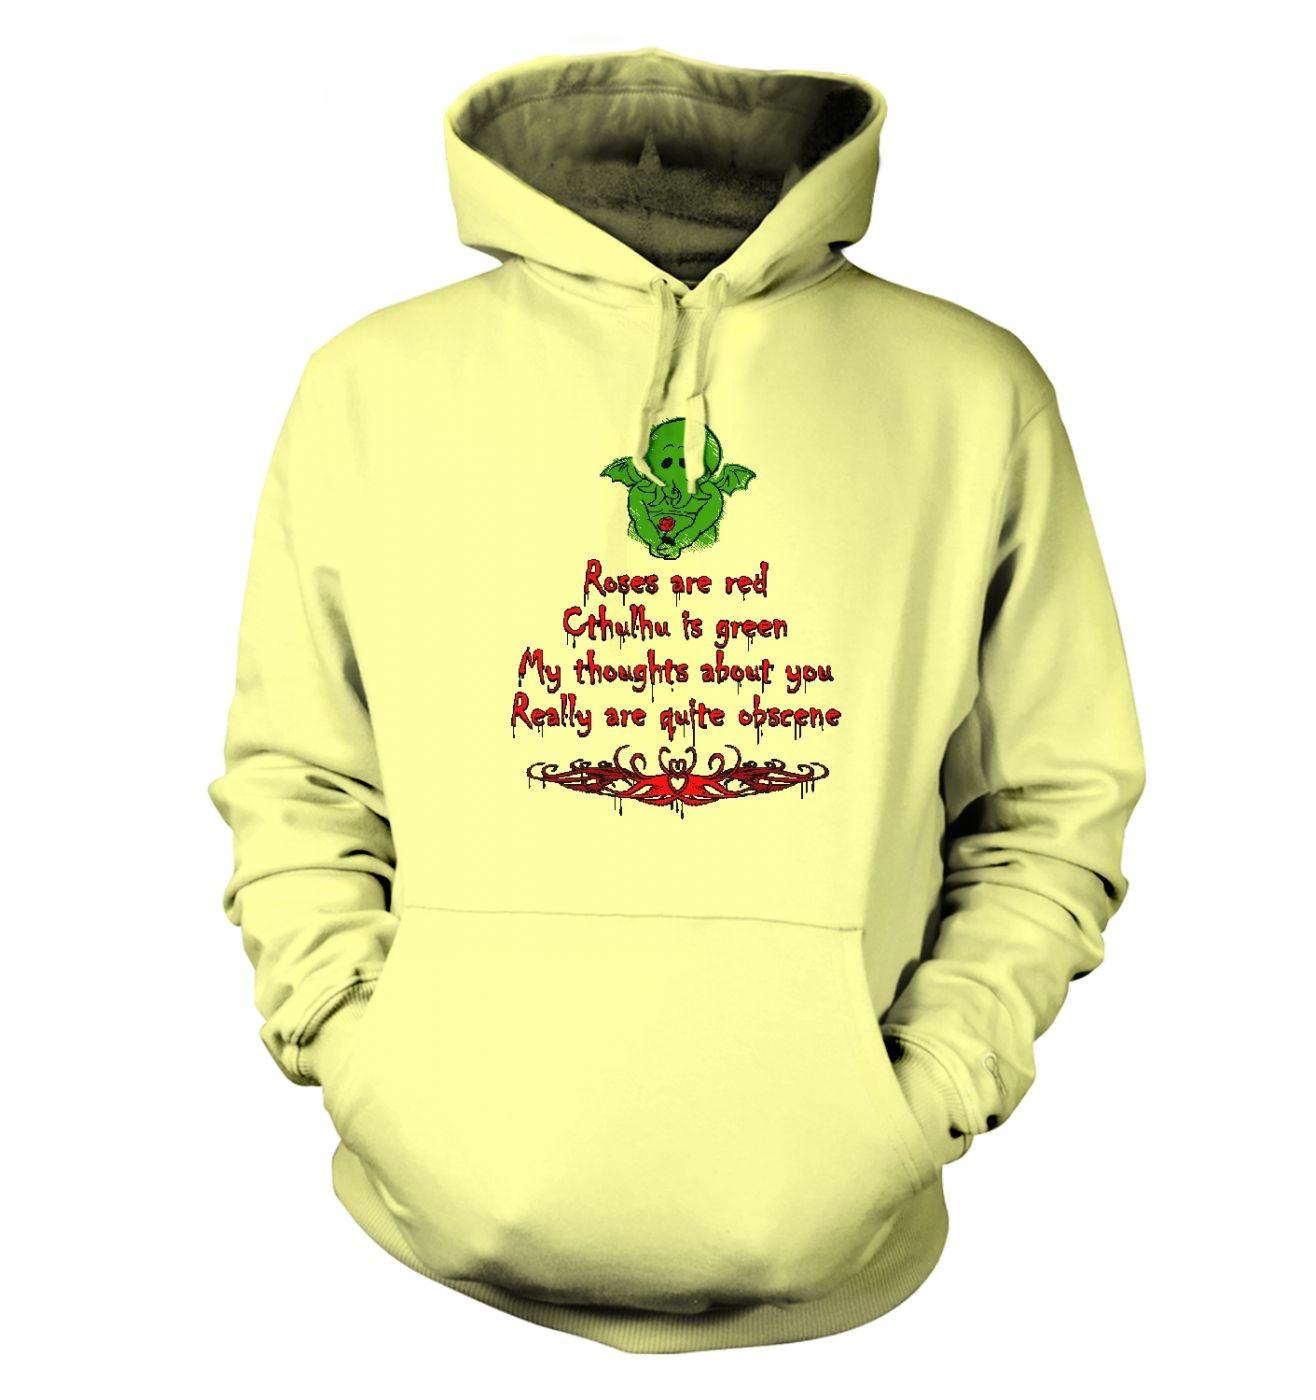 Obscene Cthulhu valentine hoodie